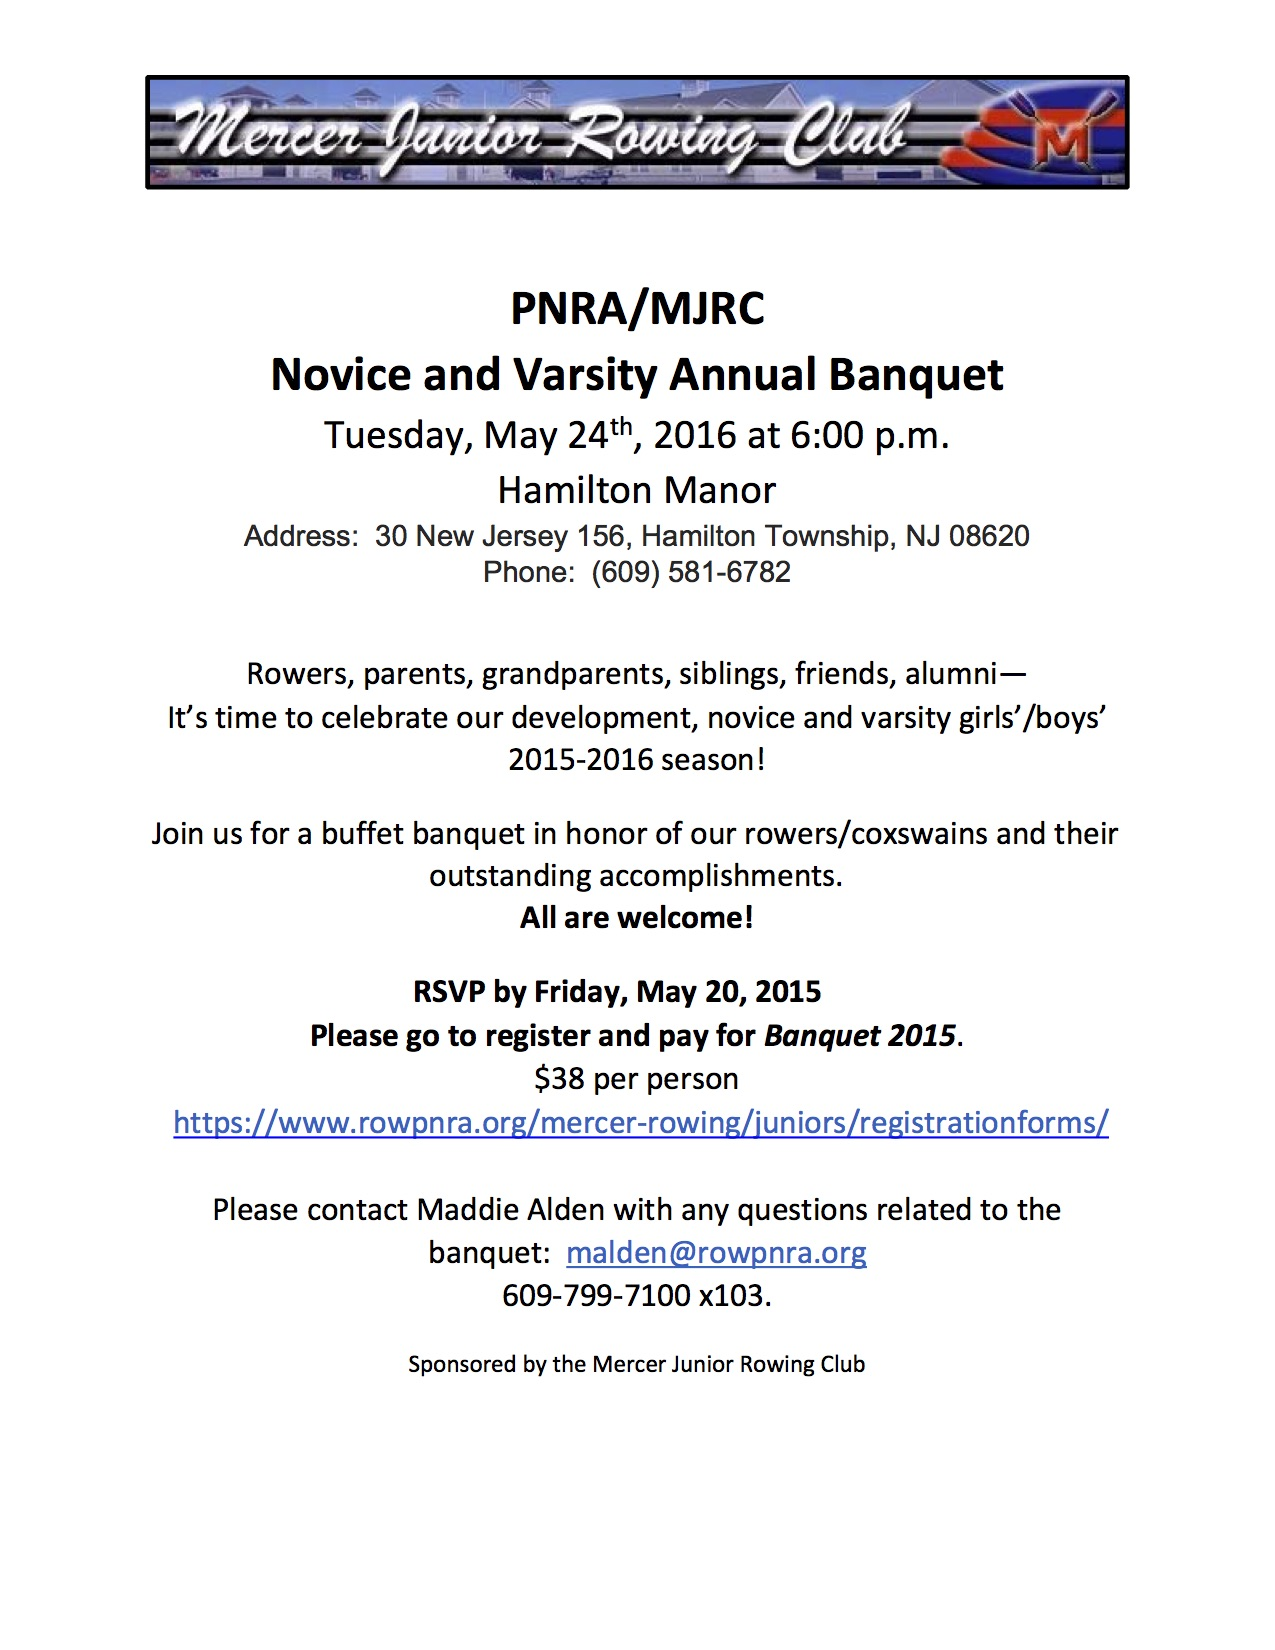 PNRA-MJRC Banquet Invitation 2016